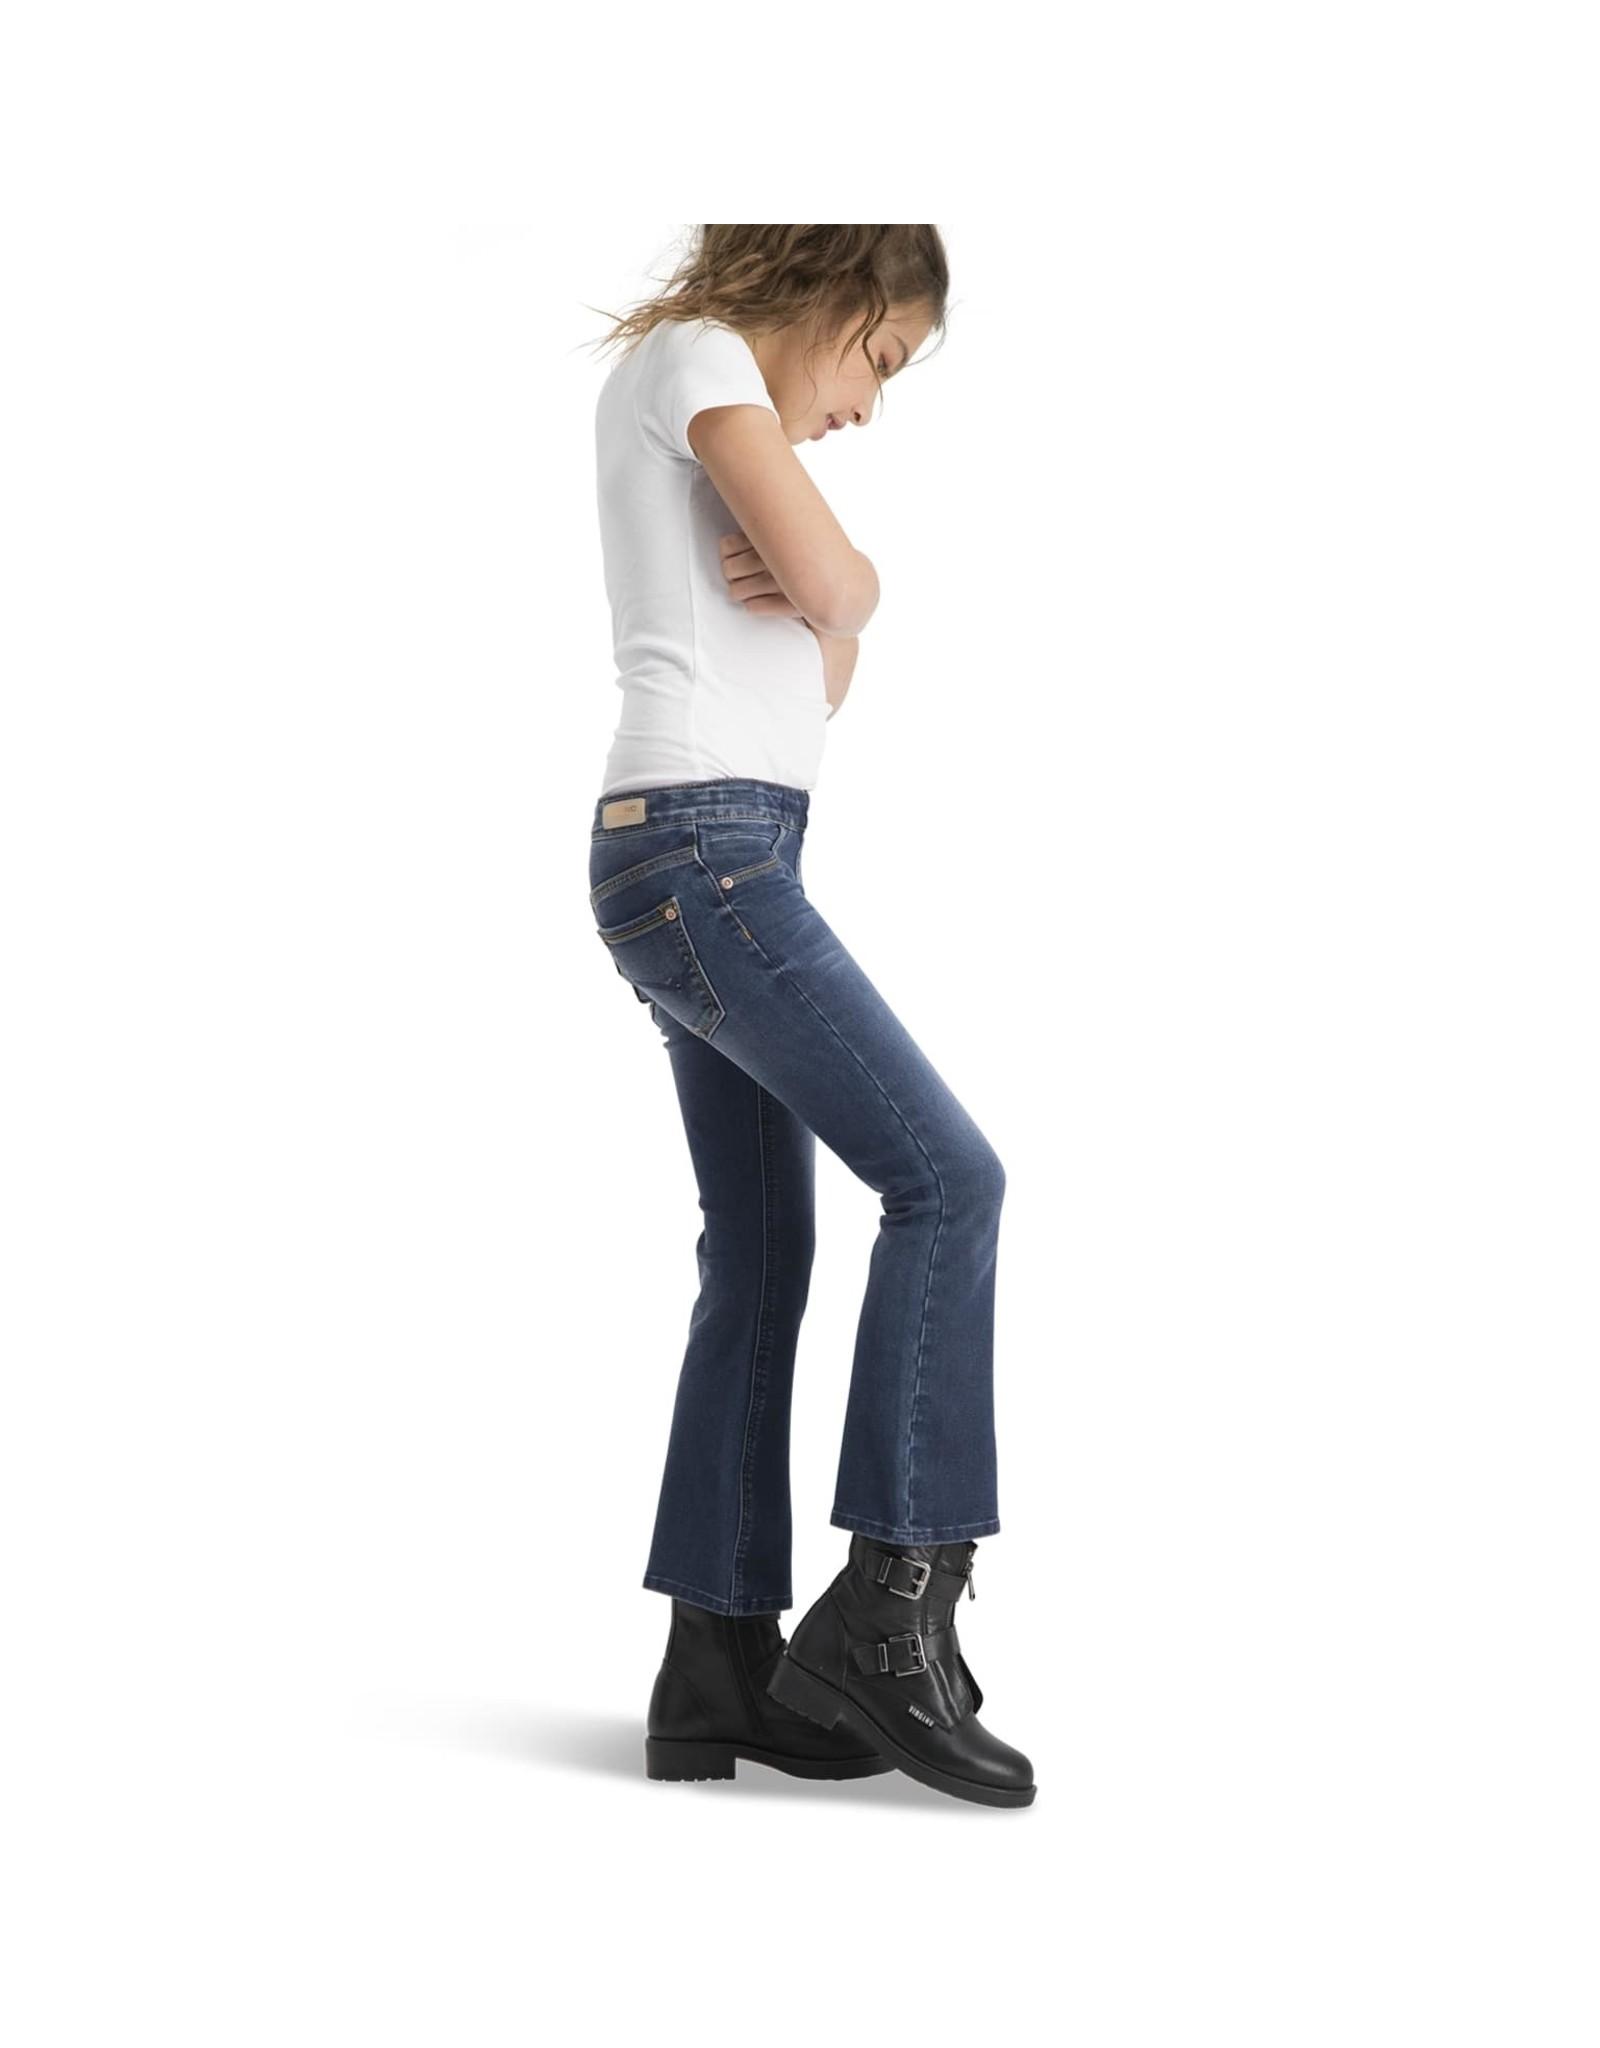 Vingino Vingino meiden 4-way stretch flairedpants Britney  Blue Vintage